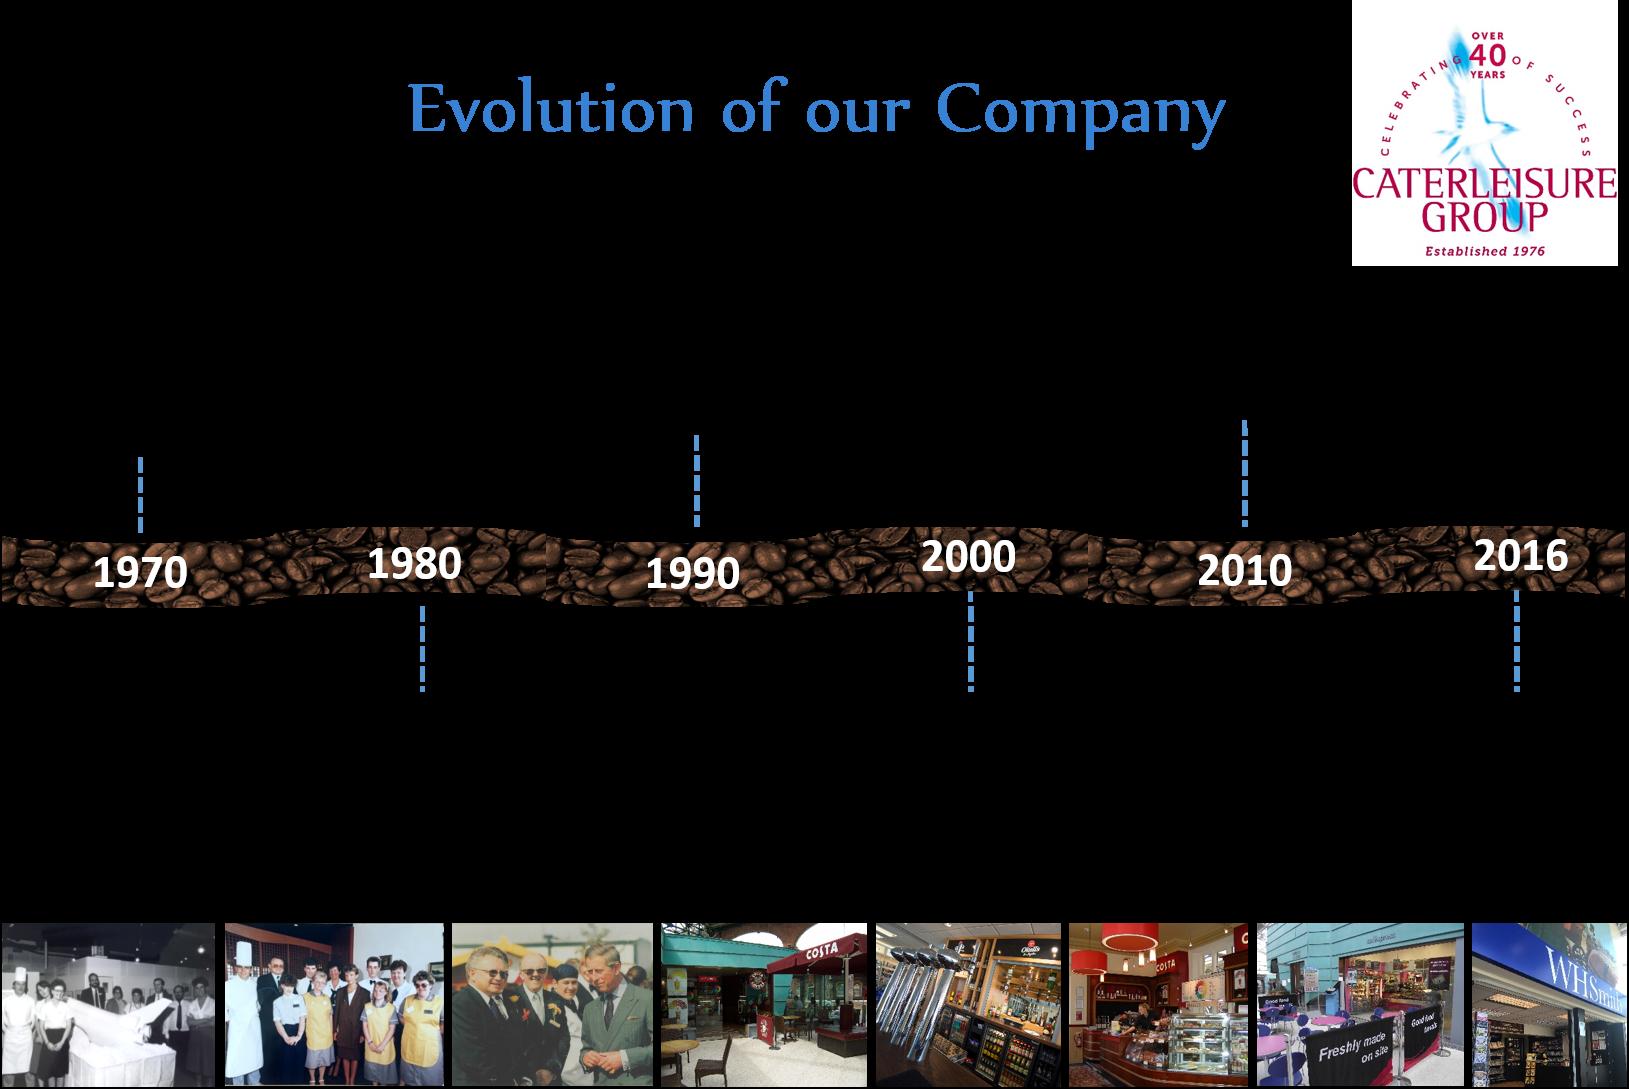 caterleisure-evolution-40th-anniversary